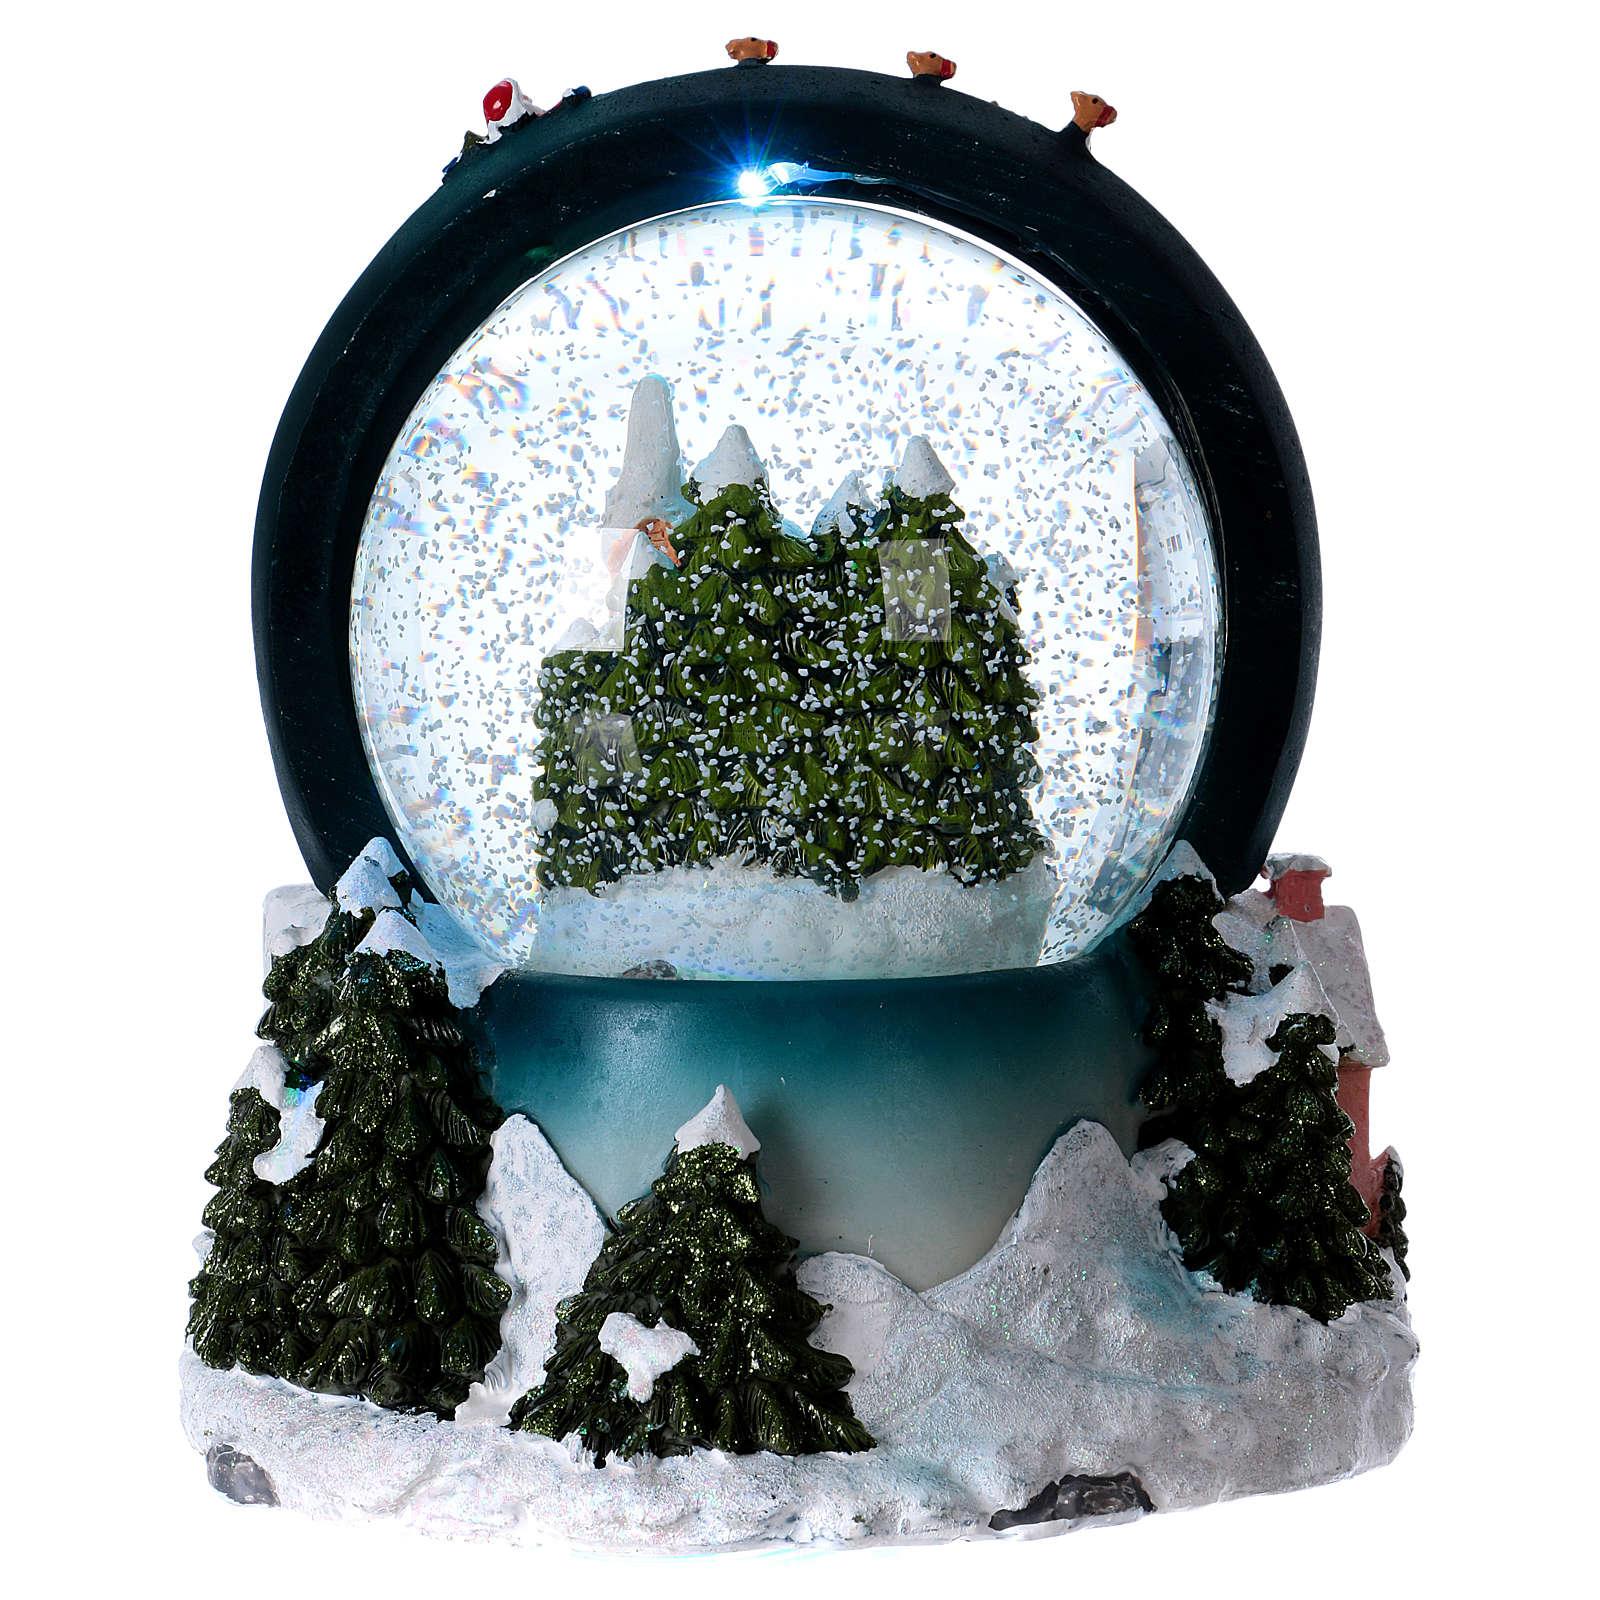 Sfera vetro neve luci movimento 20 cm resina 3